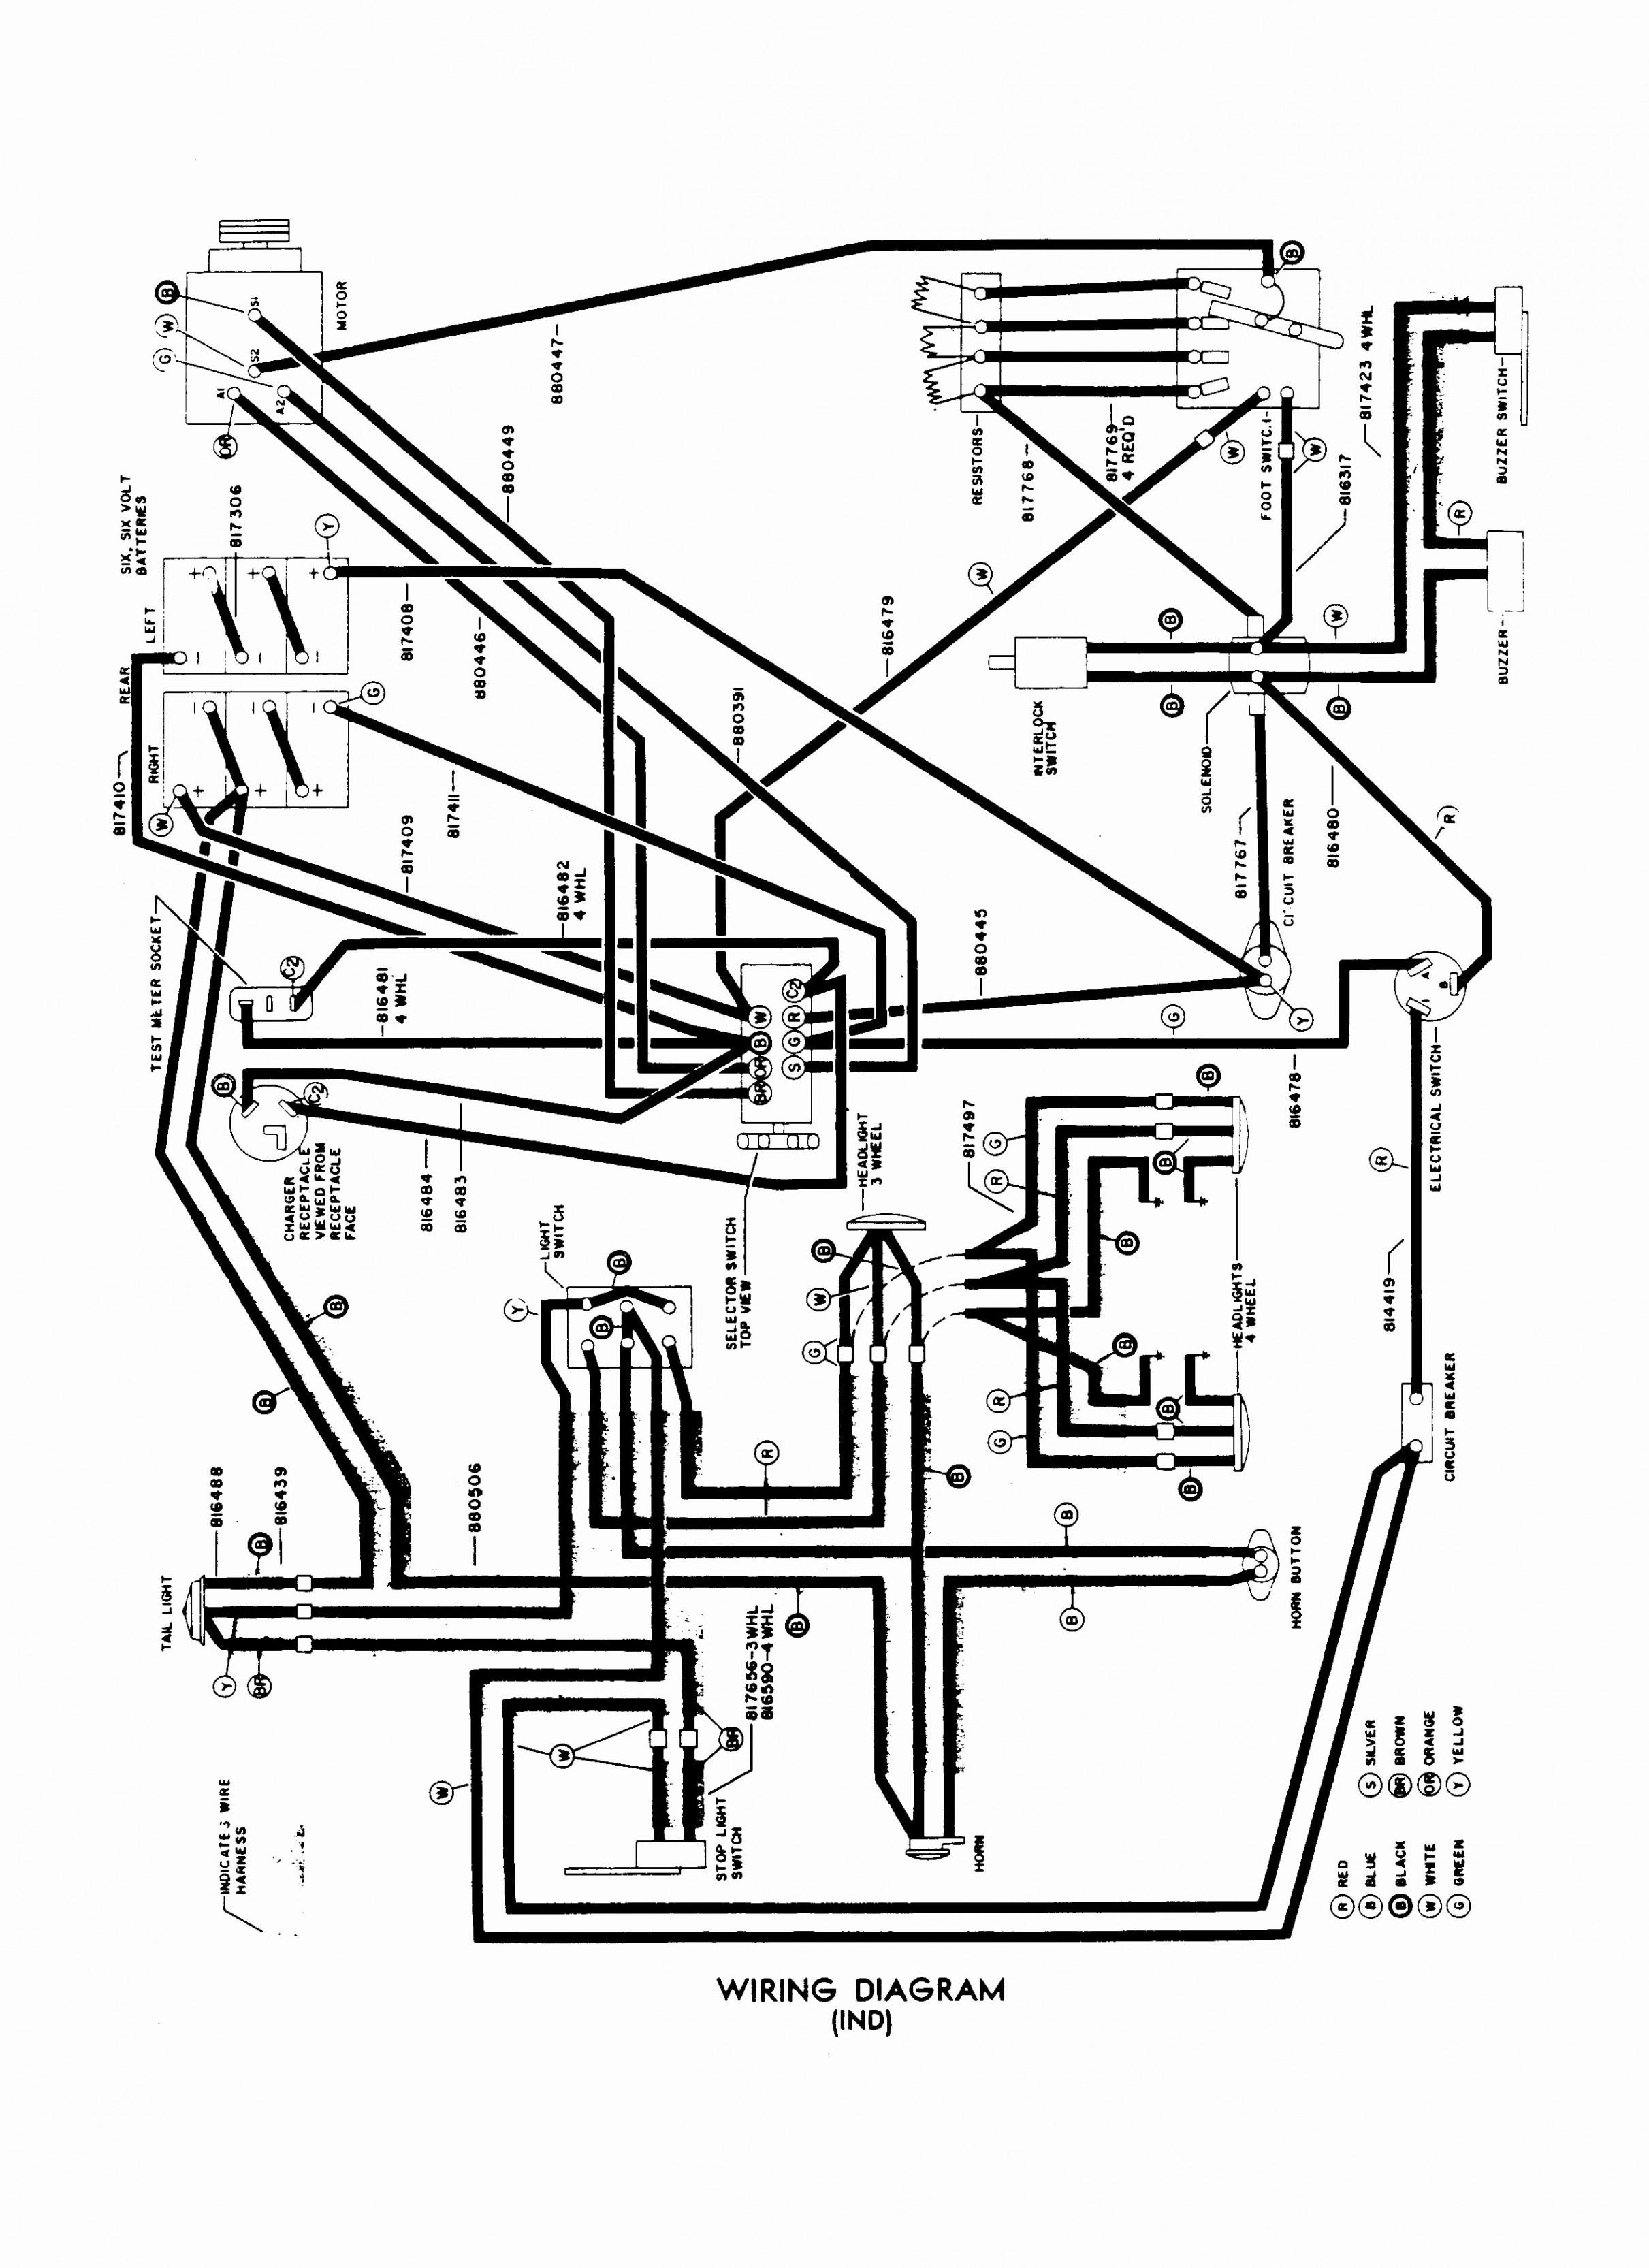 Club Car Parts Diagram Front End Club Car Wiring Diagram 36 Volt – Ez Go Wiring Diagram for Golf Cart Of Club Car Parts Diagram Front End